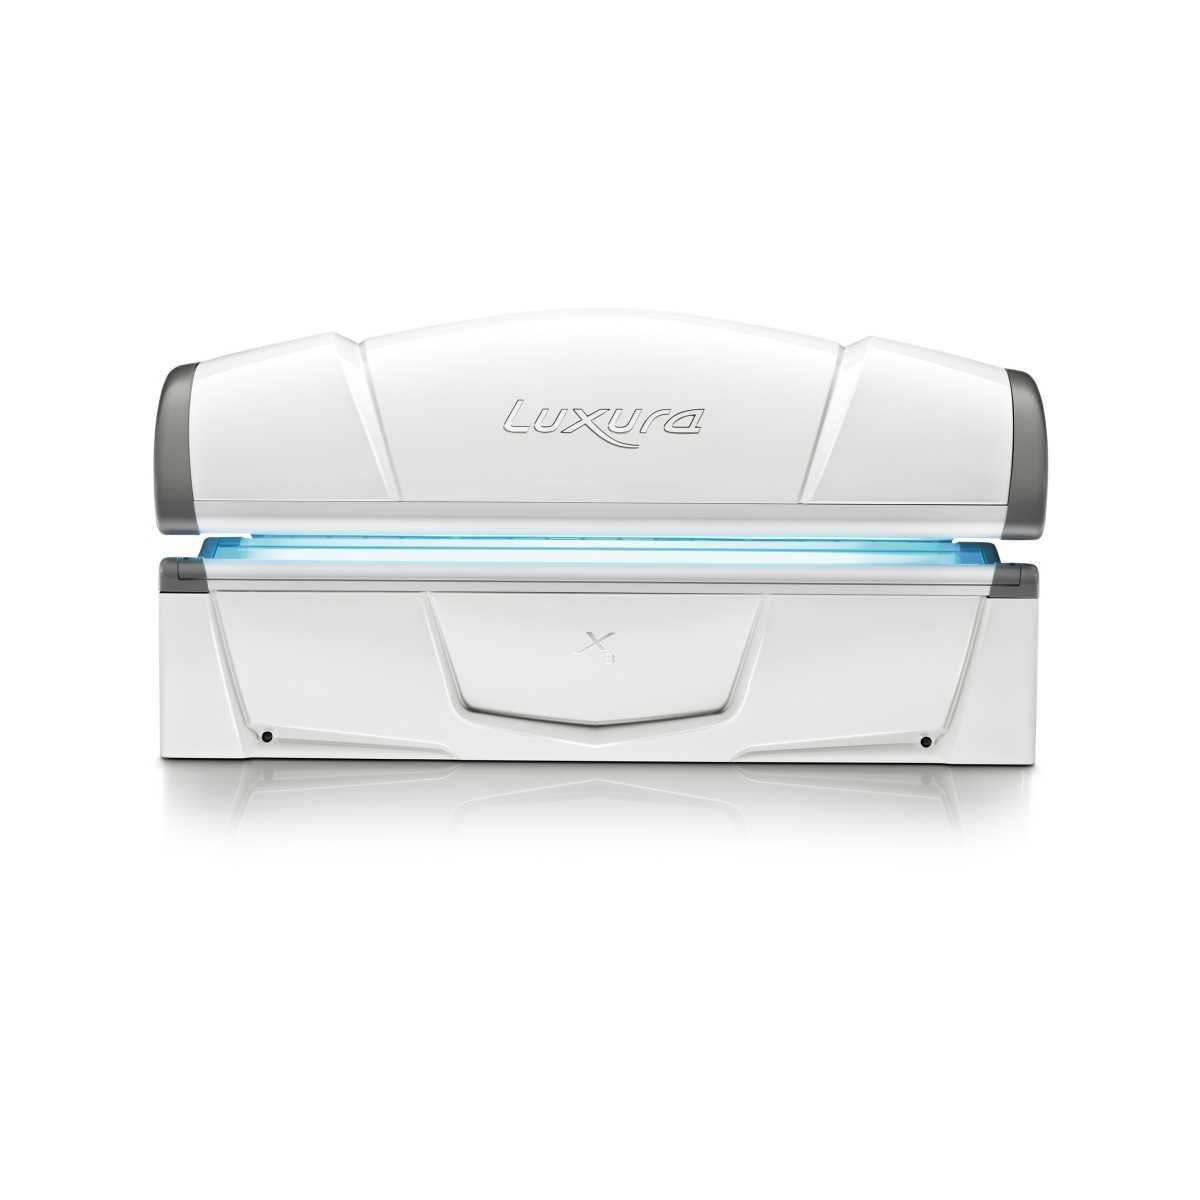 Hapro Luxura X3 30 SLI